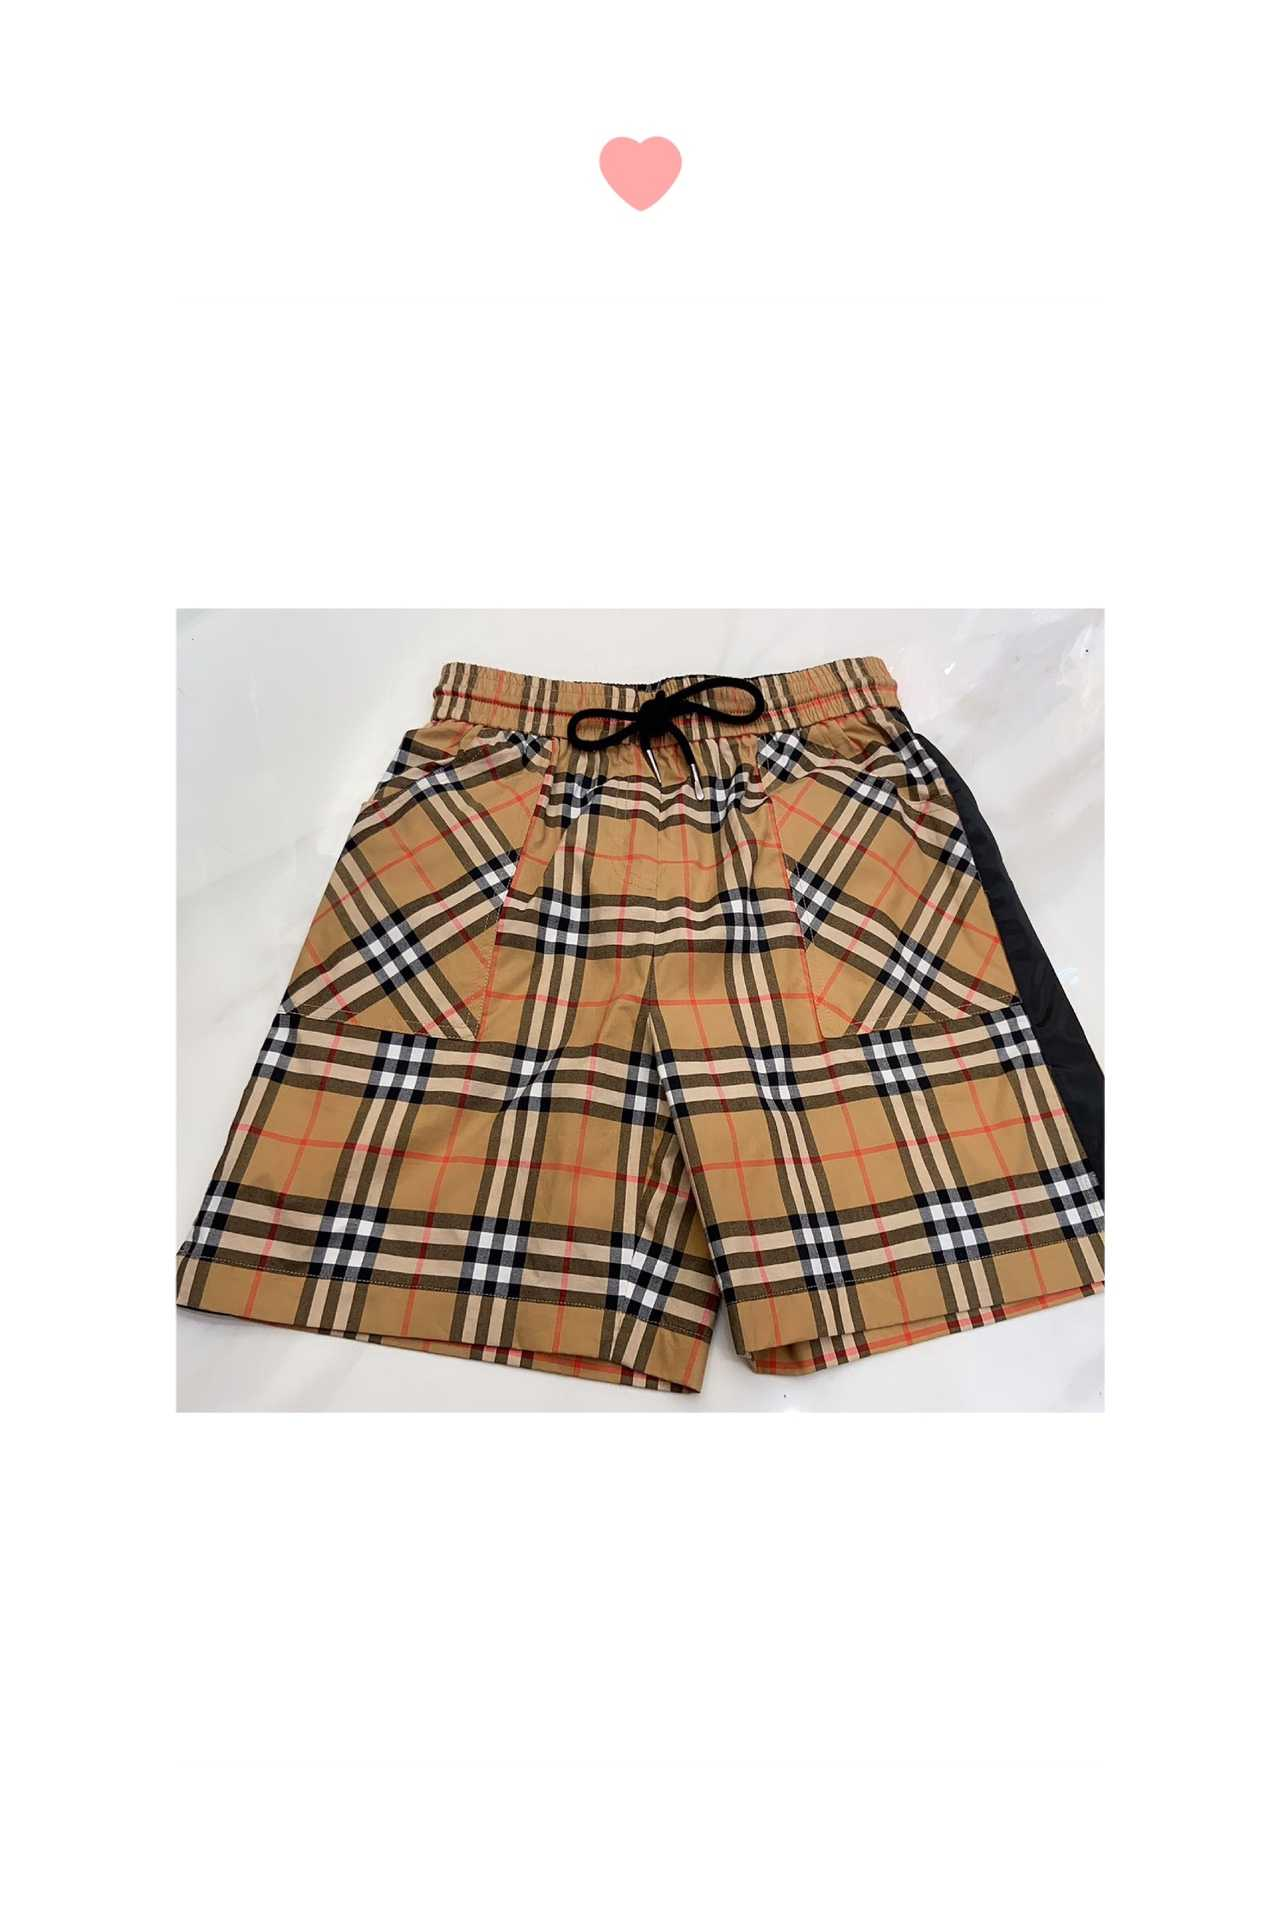 BUS外贸出口高档格子短裤